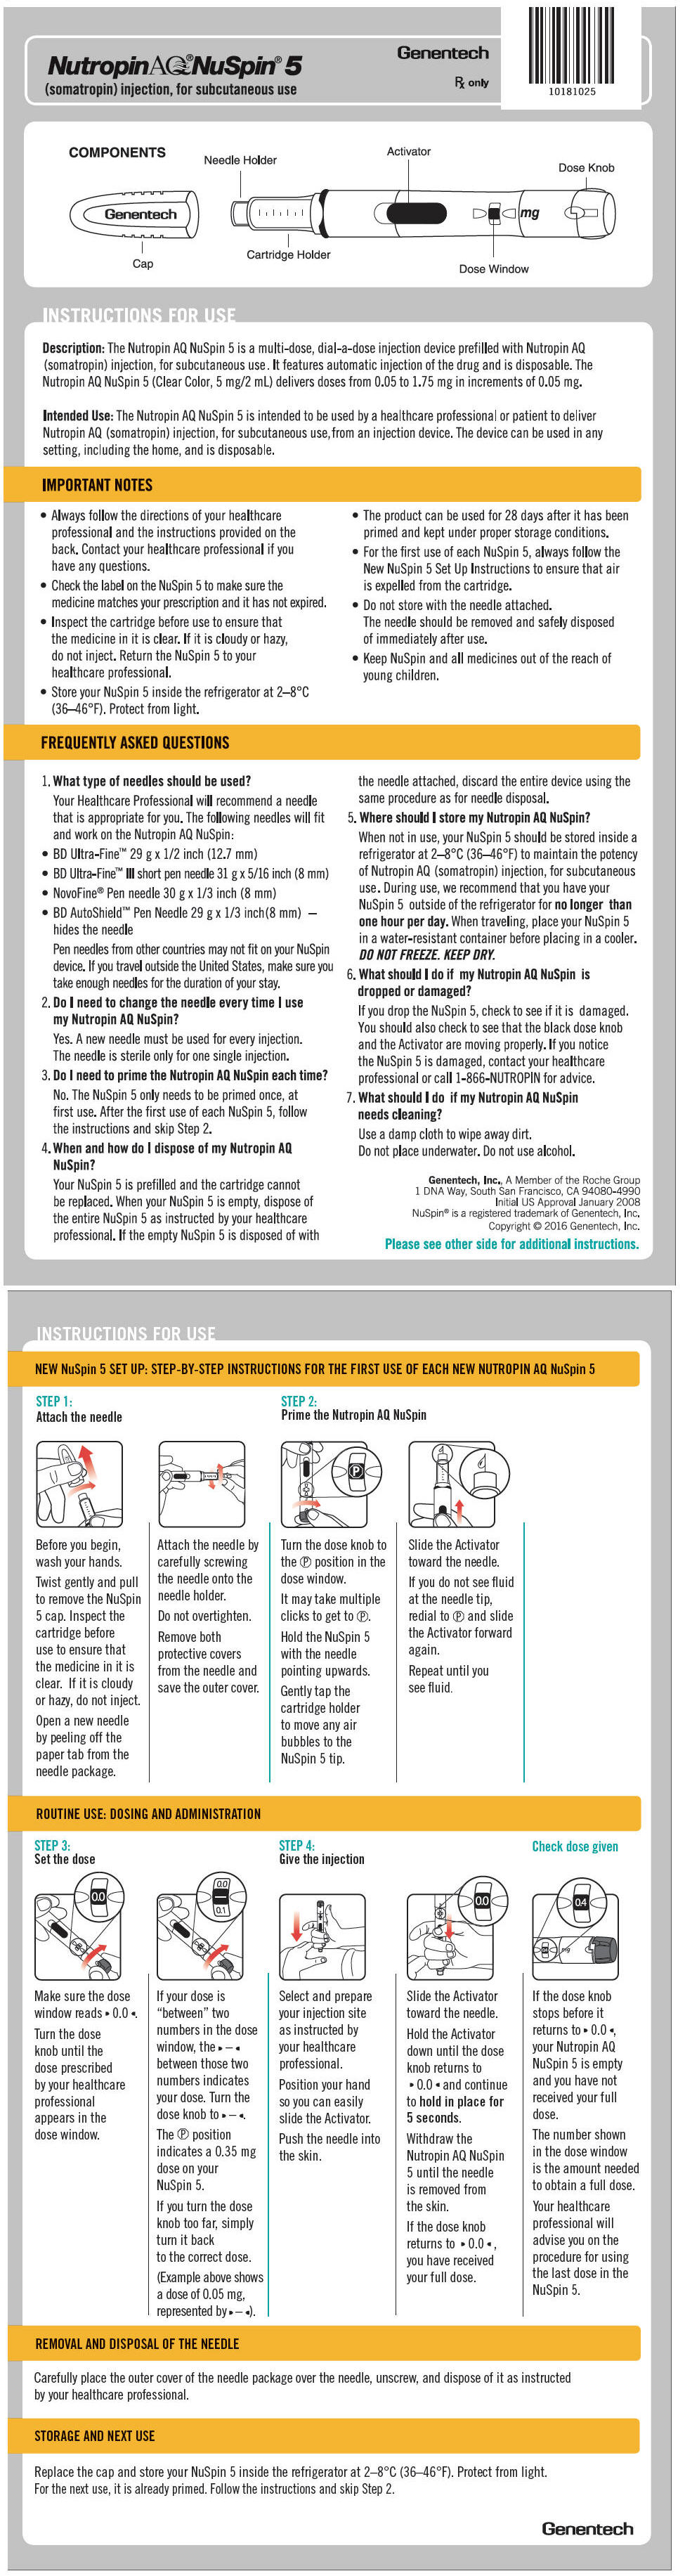 PRINCIPAL DISPLAY PANEL - 5 mg NuSpin IFU